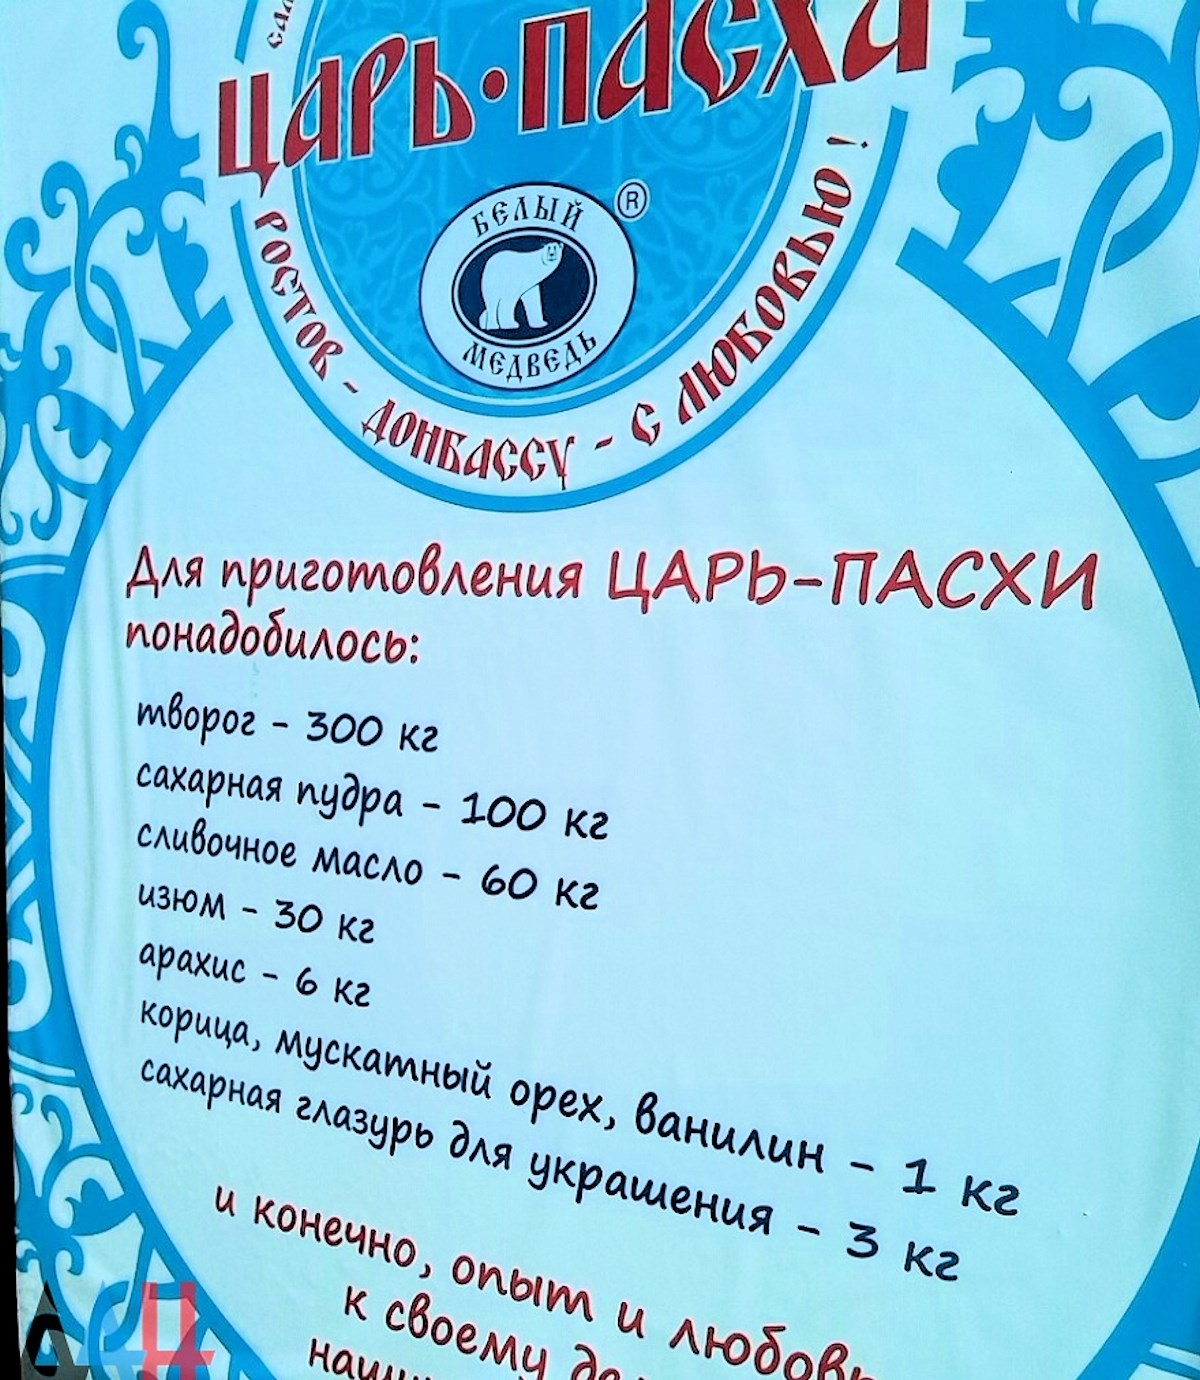 00 donetsk paskha 06. 12.04.15